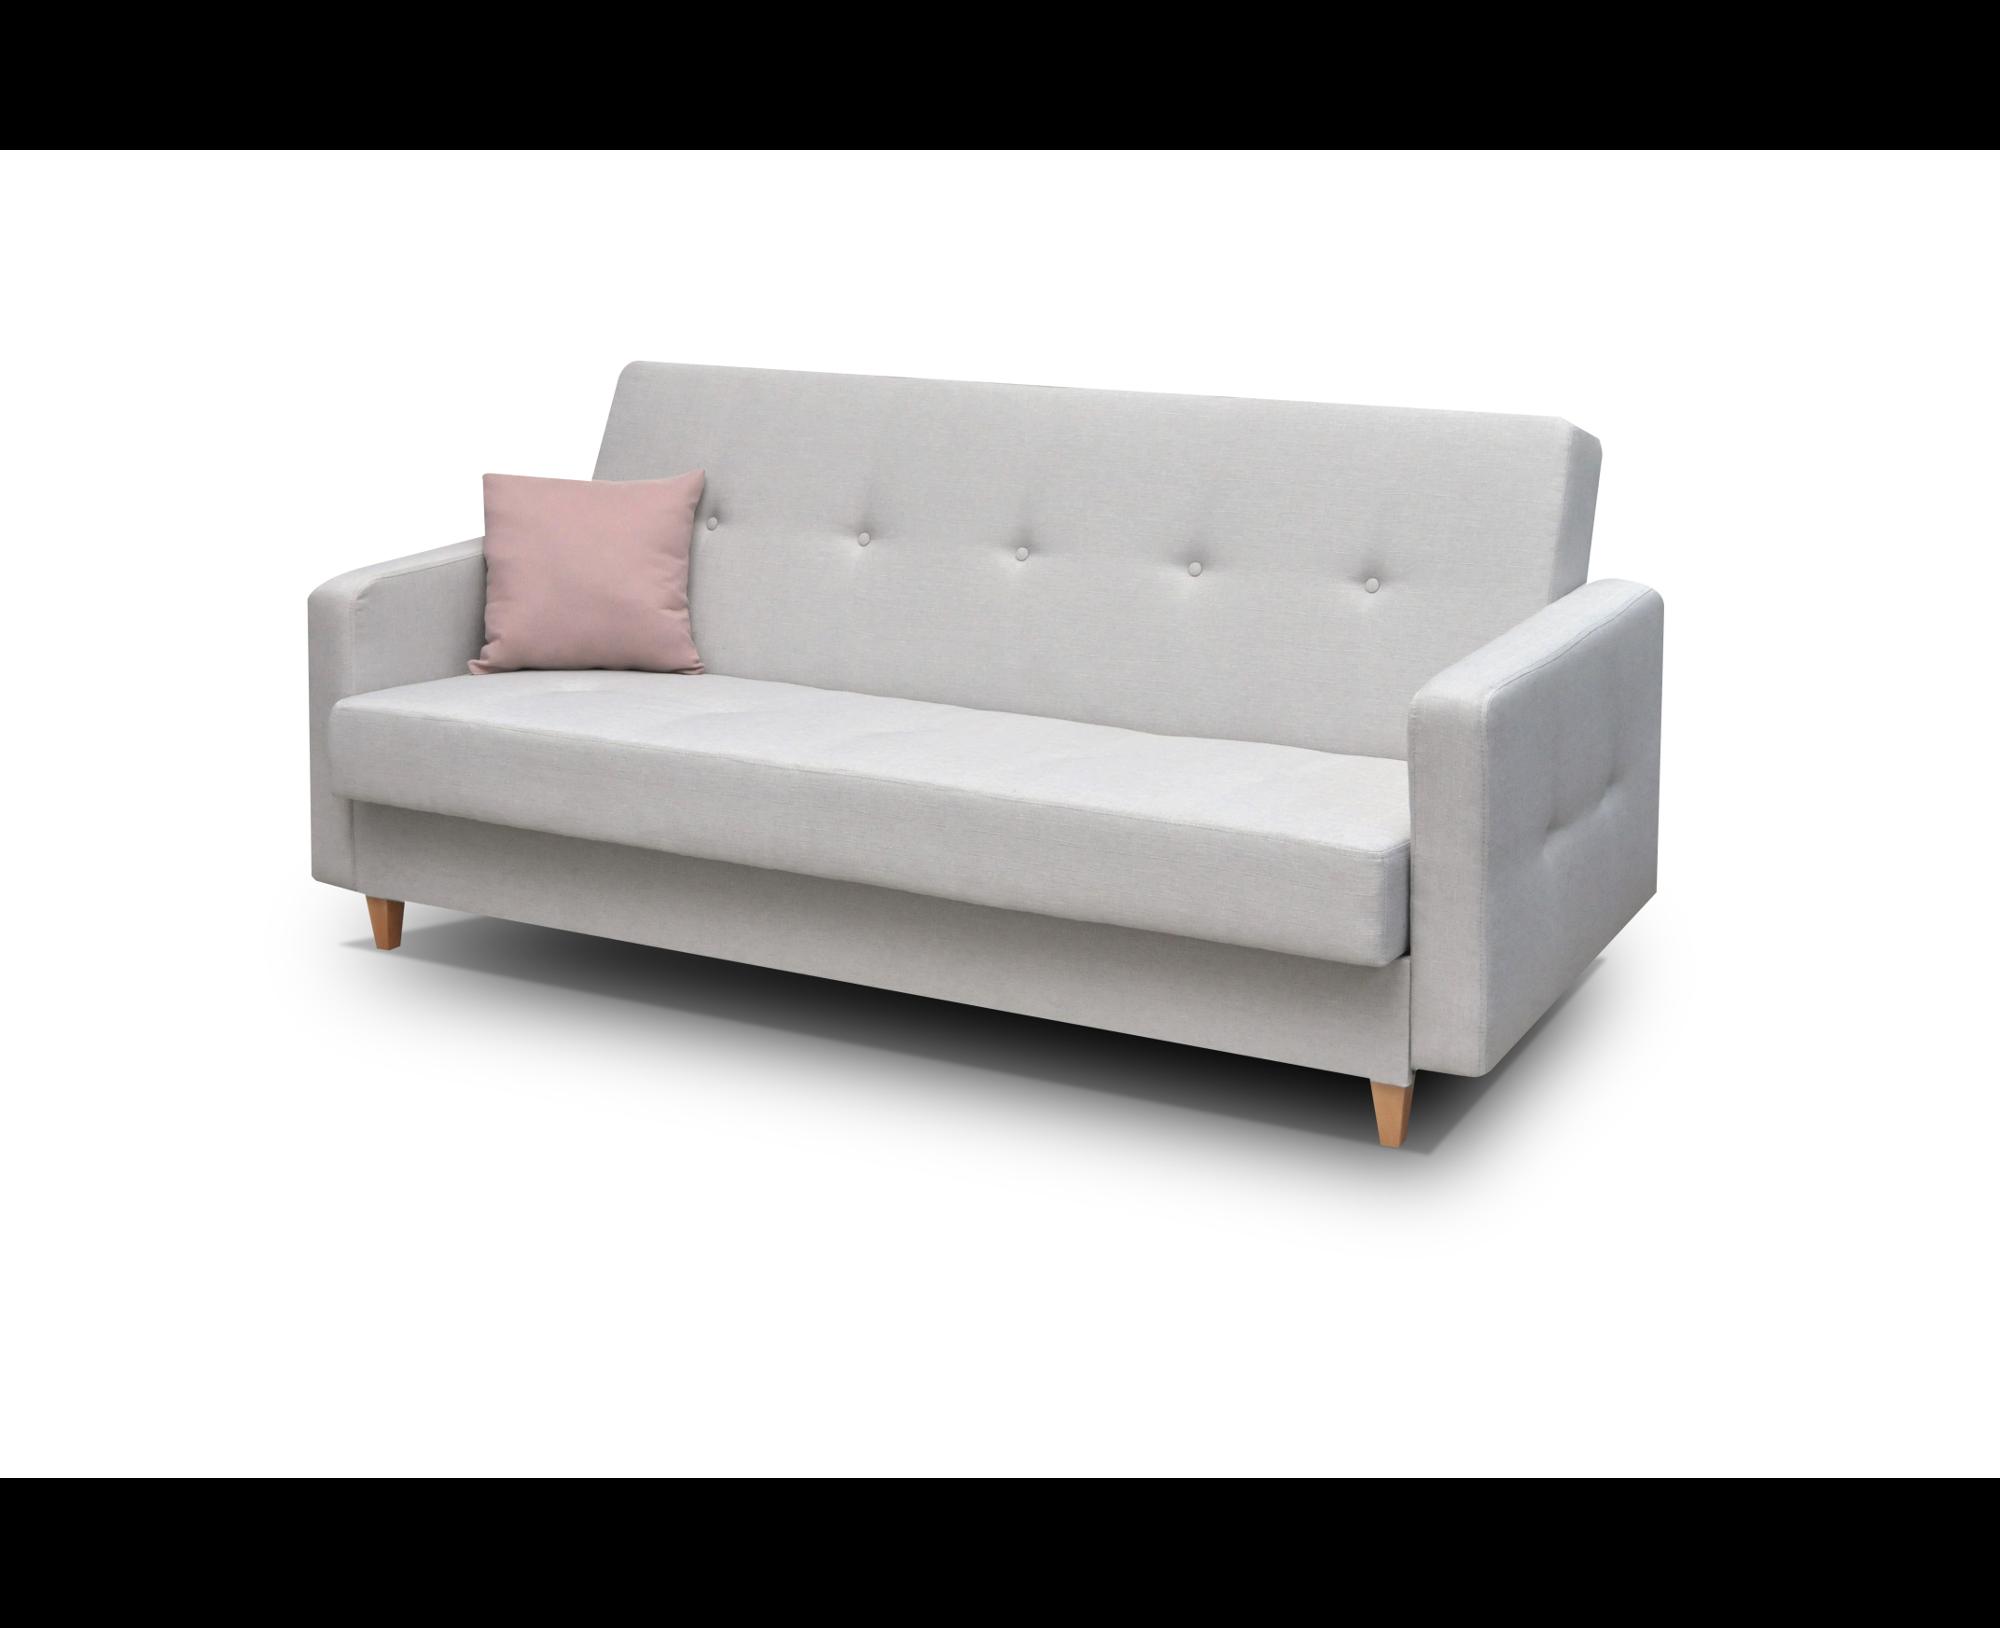 sofa perry hellgrau m bel muller braun. Black Bedroom Furniture Sets. Home Design Ideas